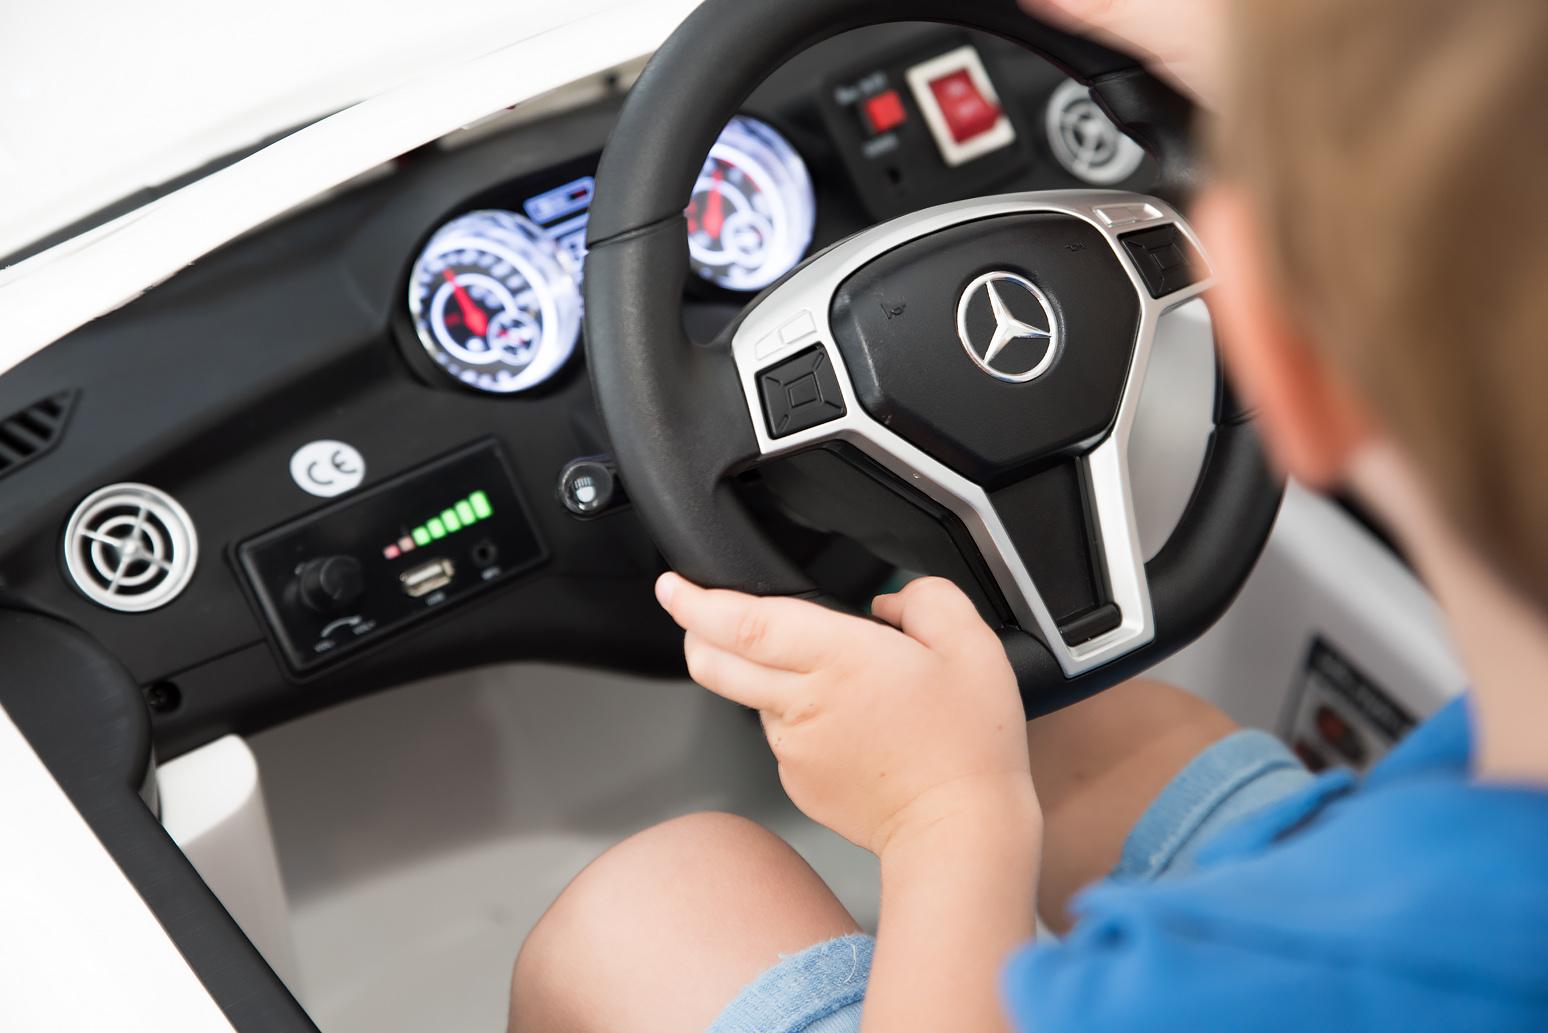 samochod mercedes dla dziecka